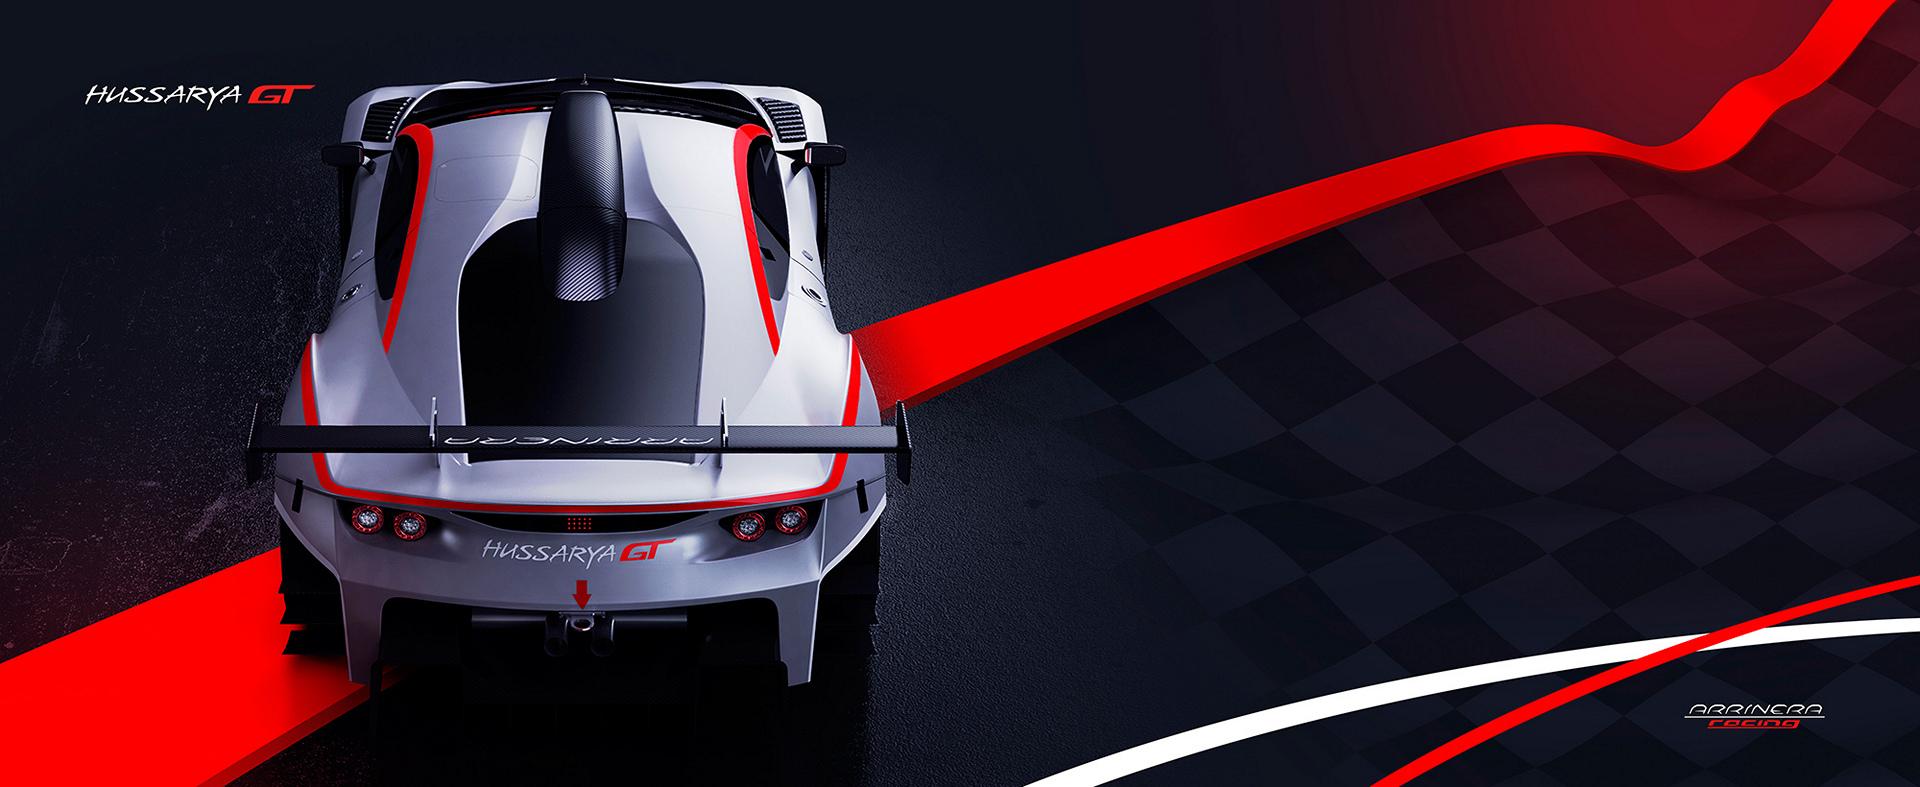 Arrinera Hussarya GT © Arrinera Racing Ltd.